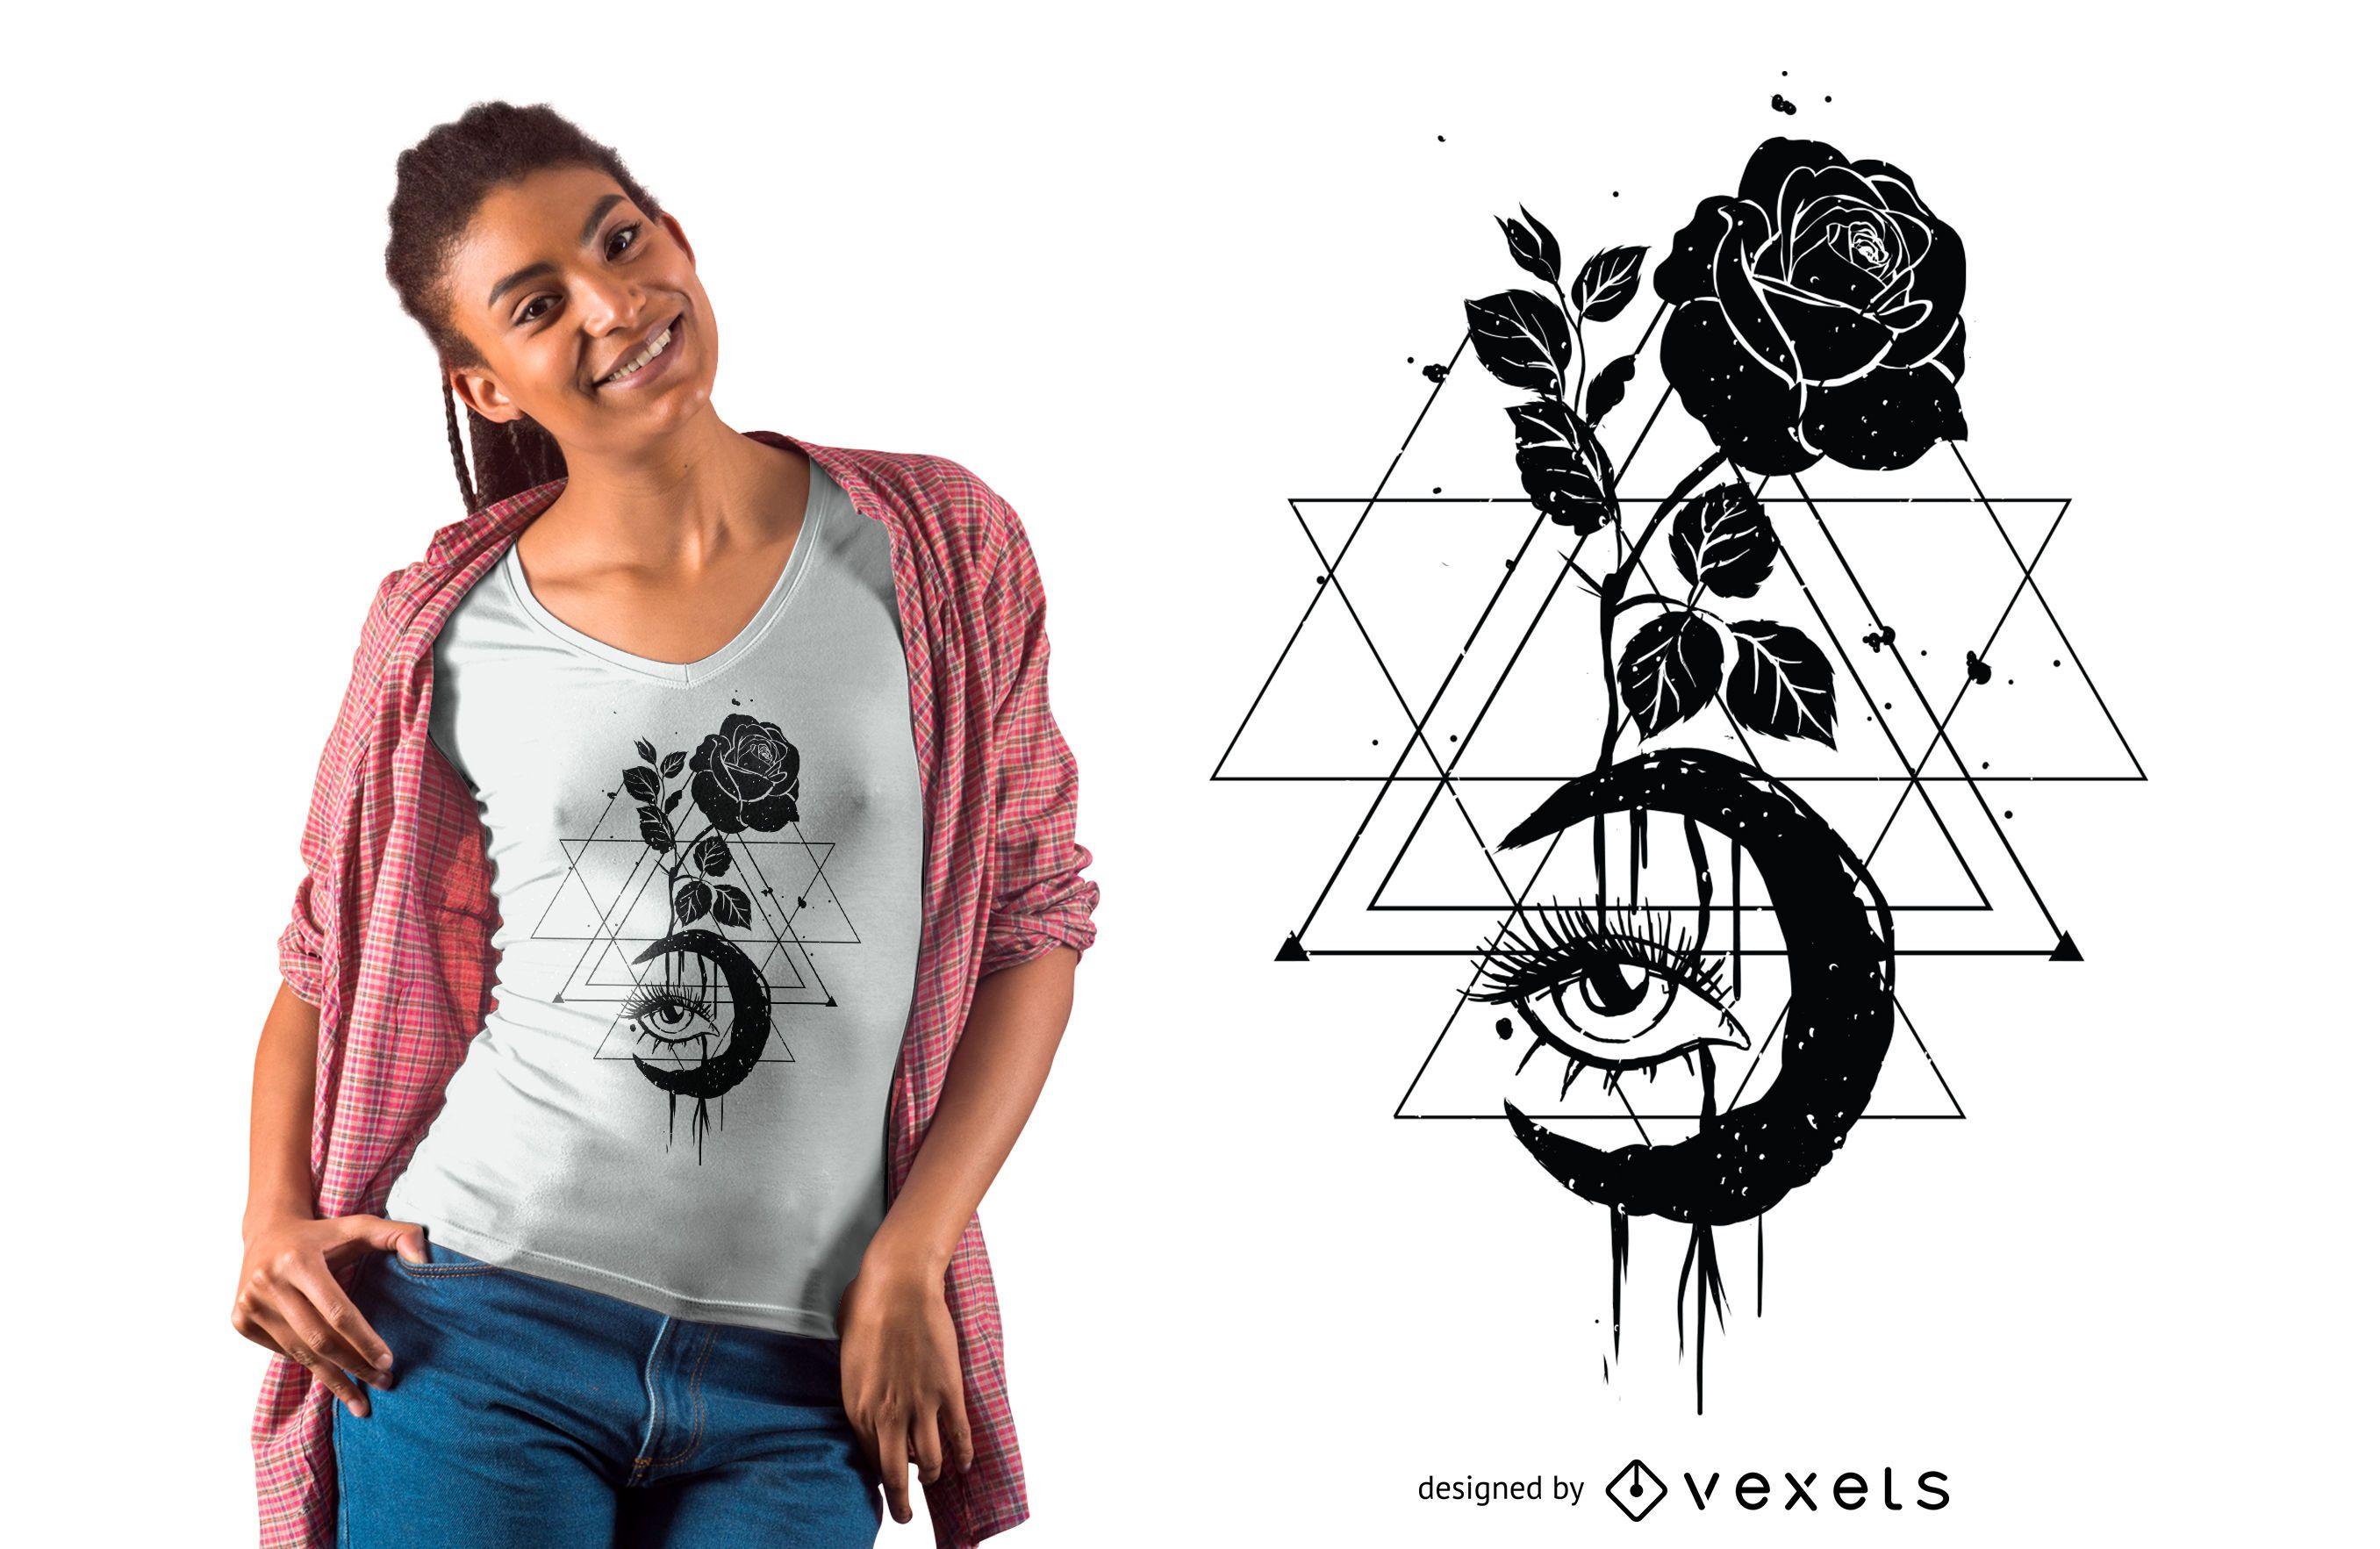 Moon rose t-shirt design